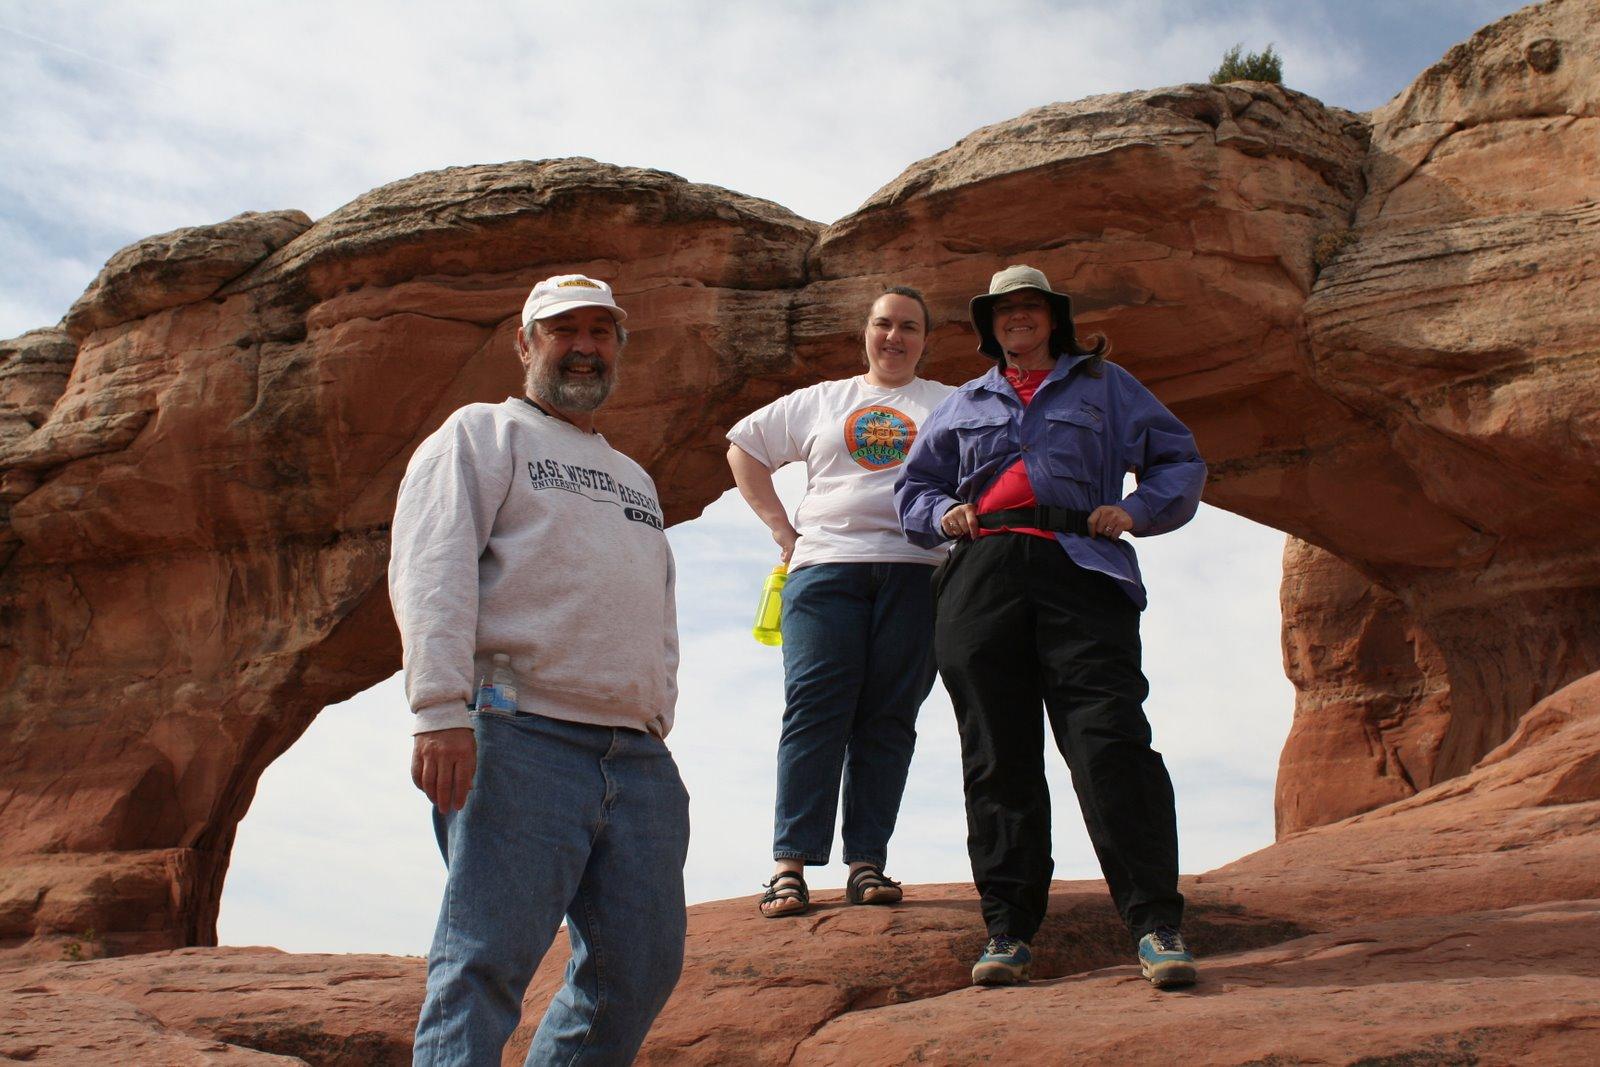 Dave, Clare, and Ellen at Broken Arch